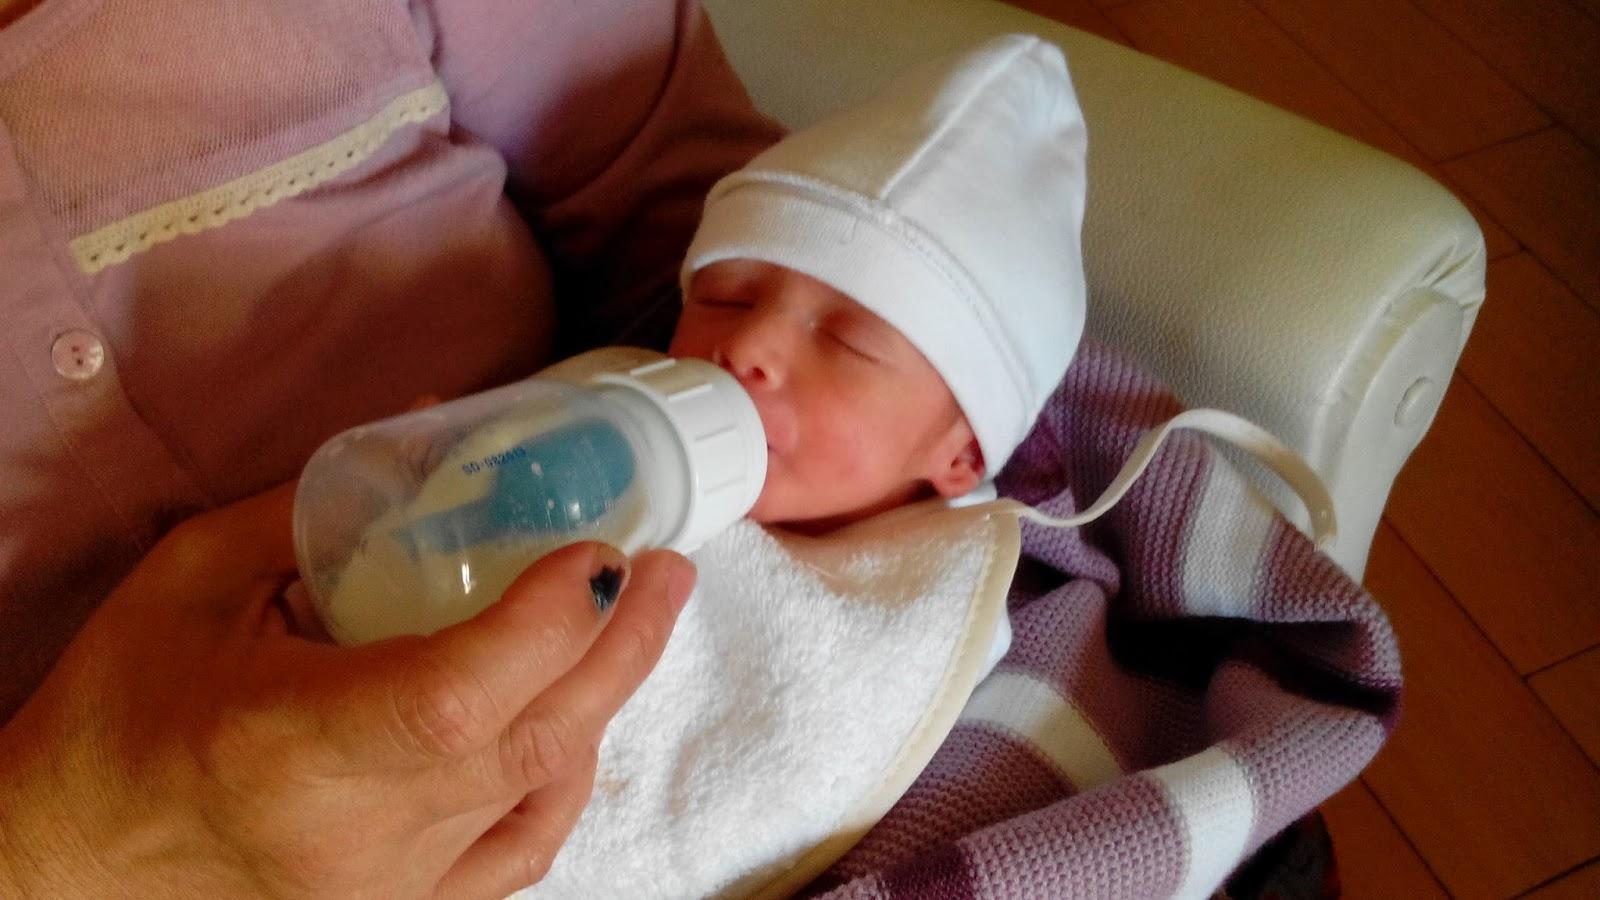 Lactancia artificial cuando falta la leche materna